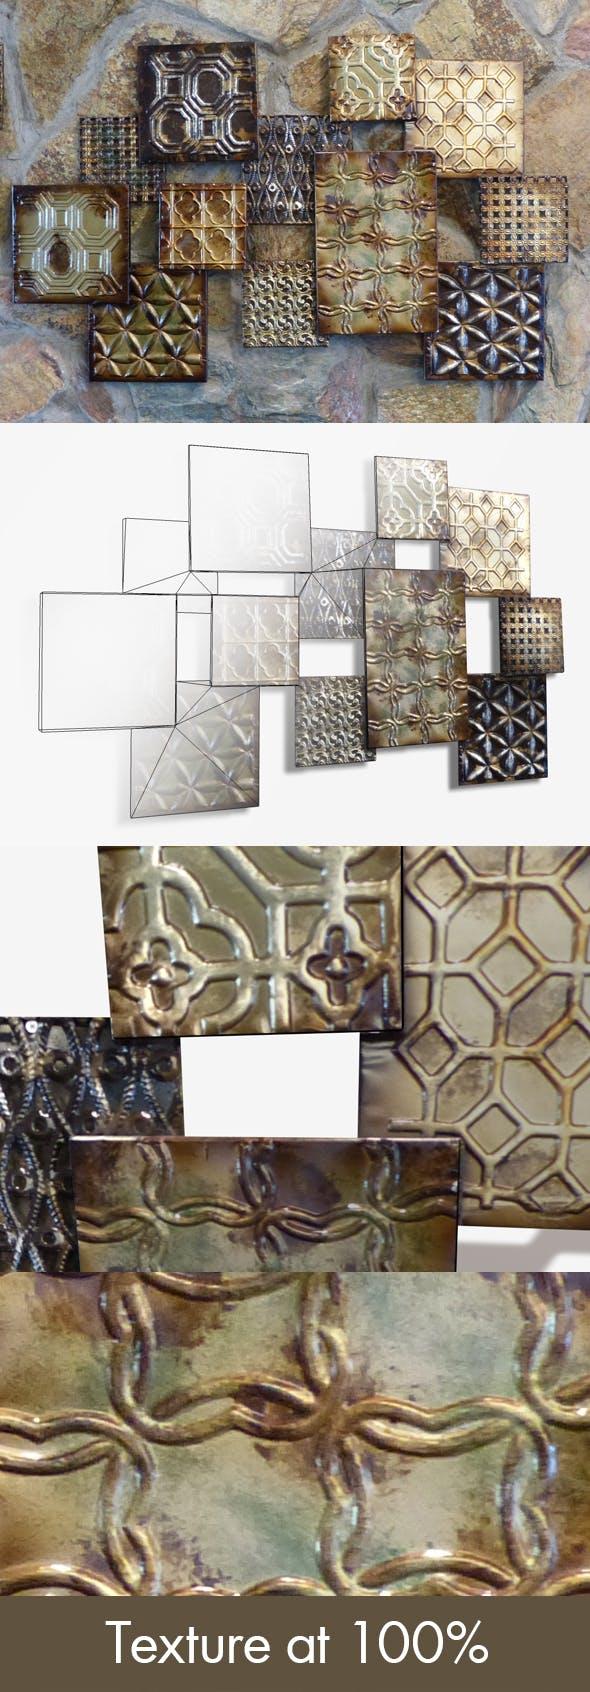 Modern Wall Art - 3DOcean Item for Sale